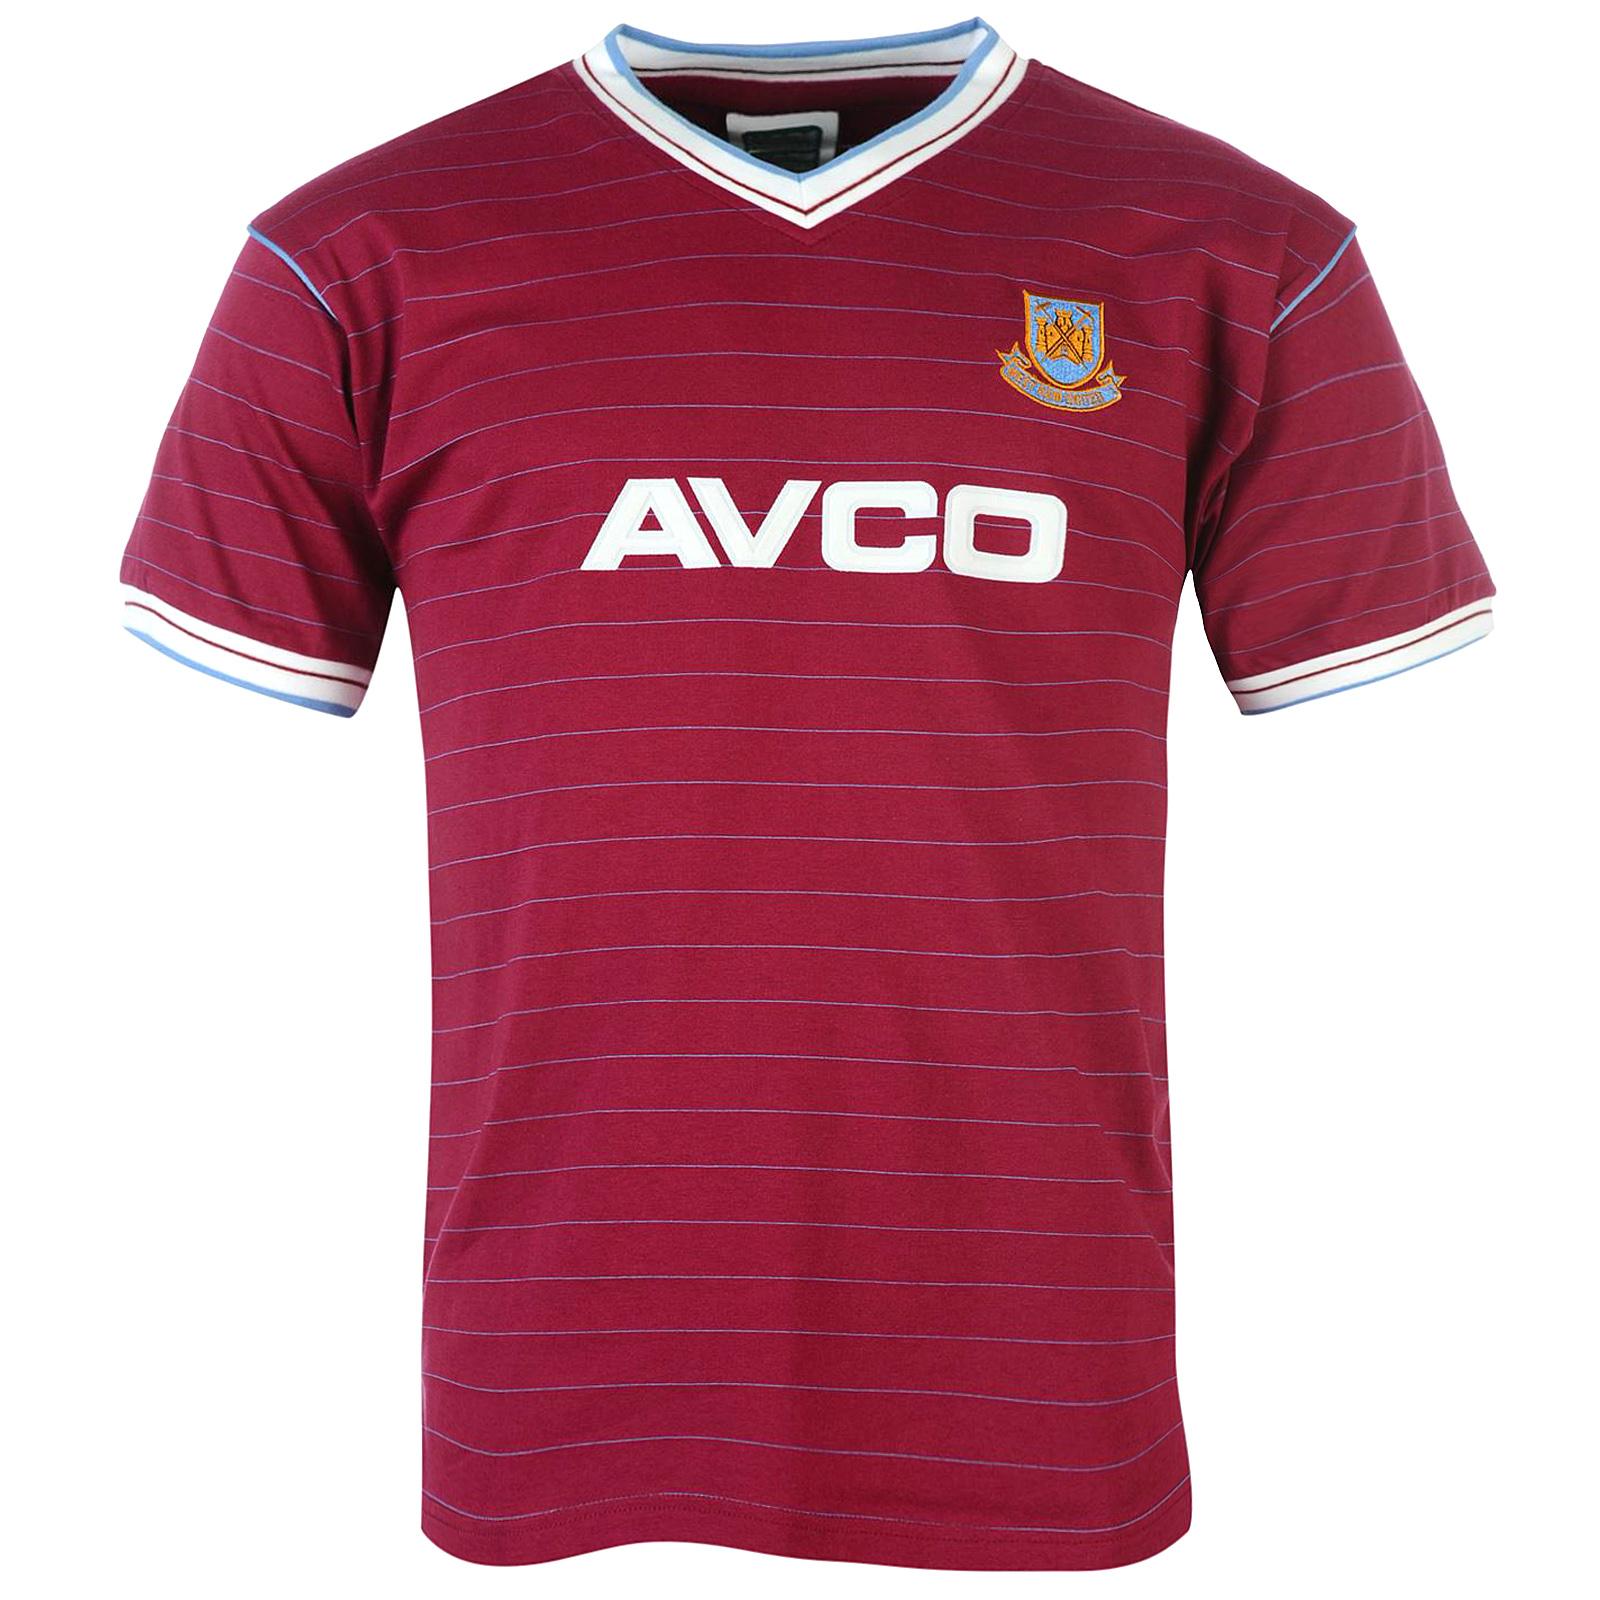 West Ham United Fc Official Football Gift Mens 1986 1983 Retro Home Kit Shirt Ebay